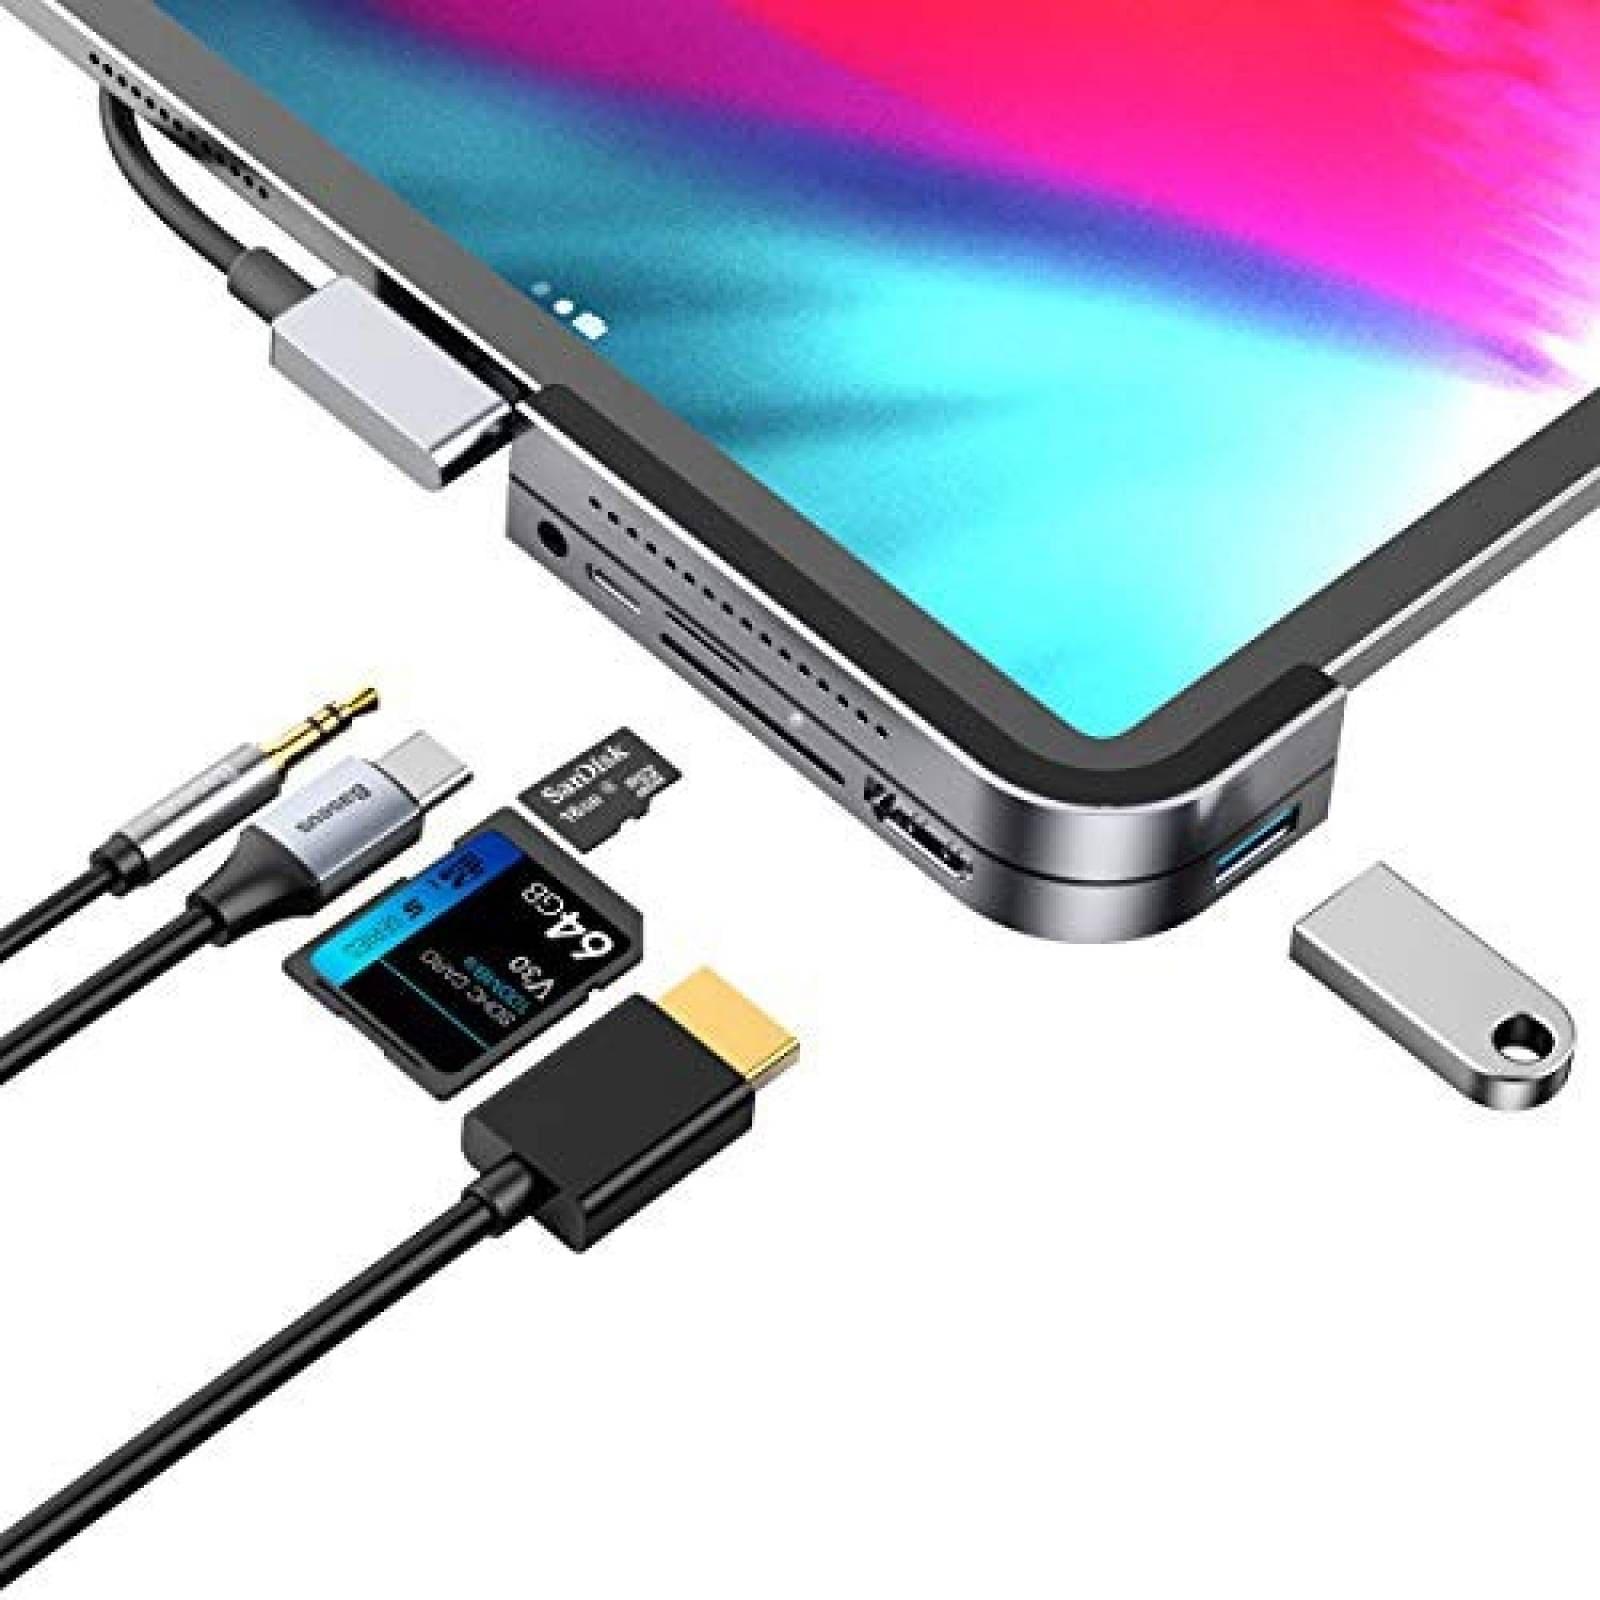 Base de Carga Baseus HubUSB C para iPad Pro HDMI Tarjeta SD